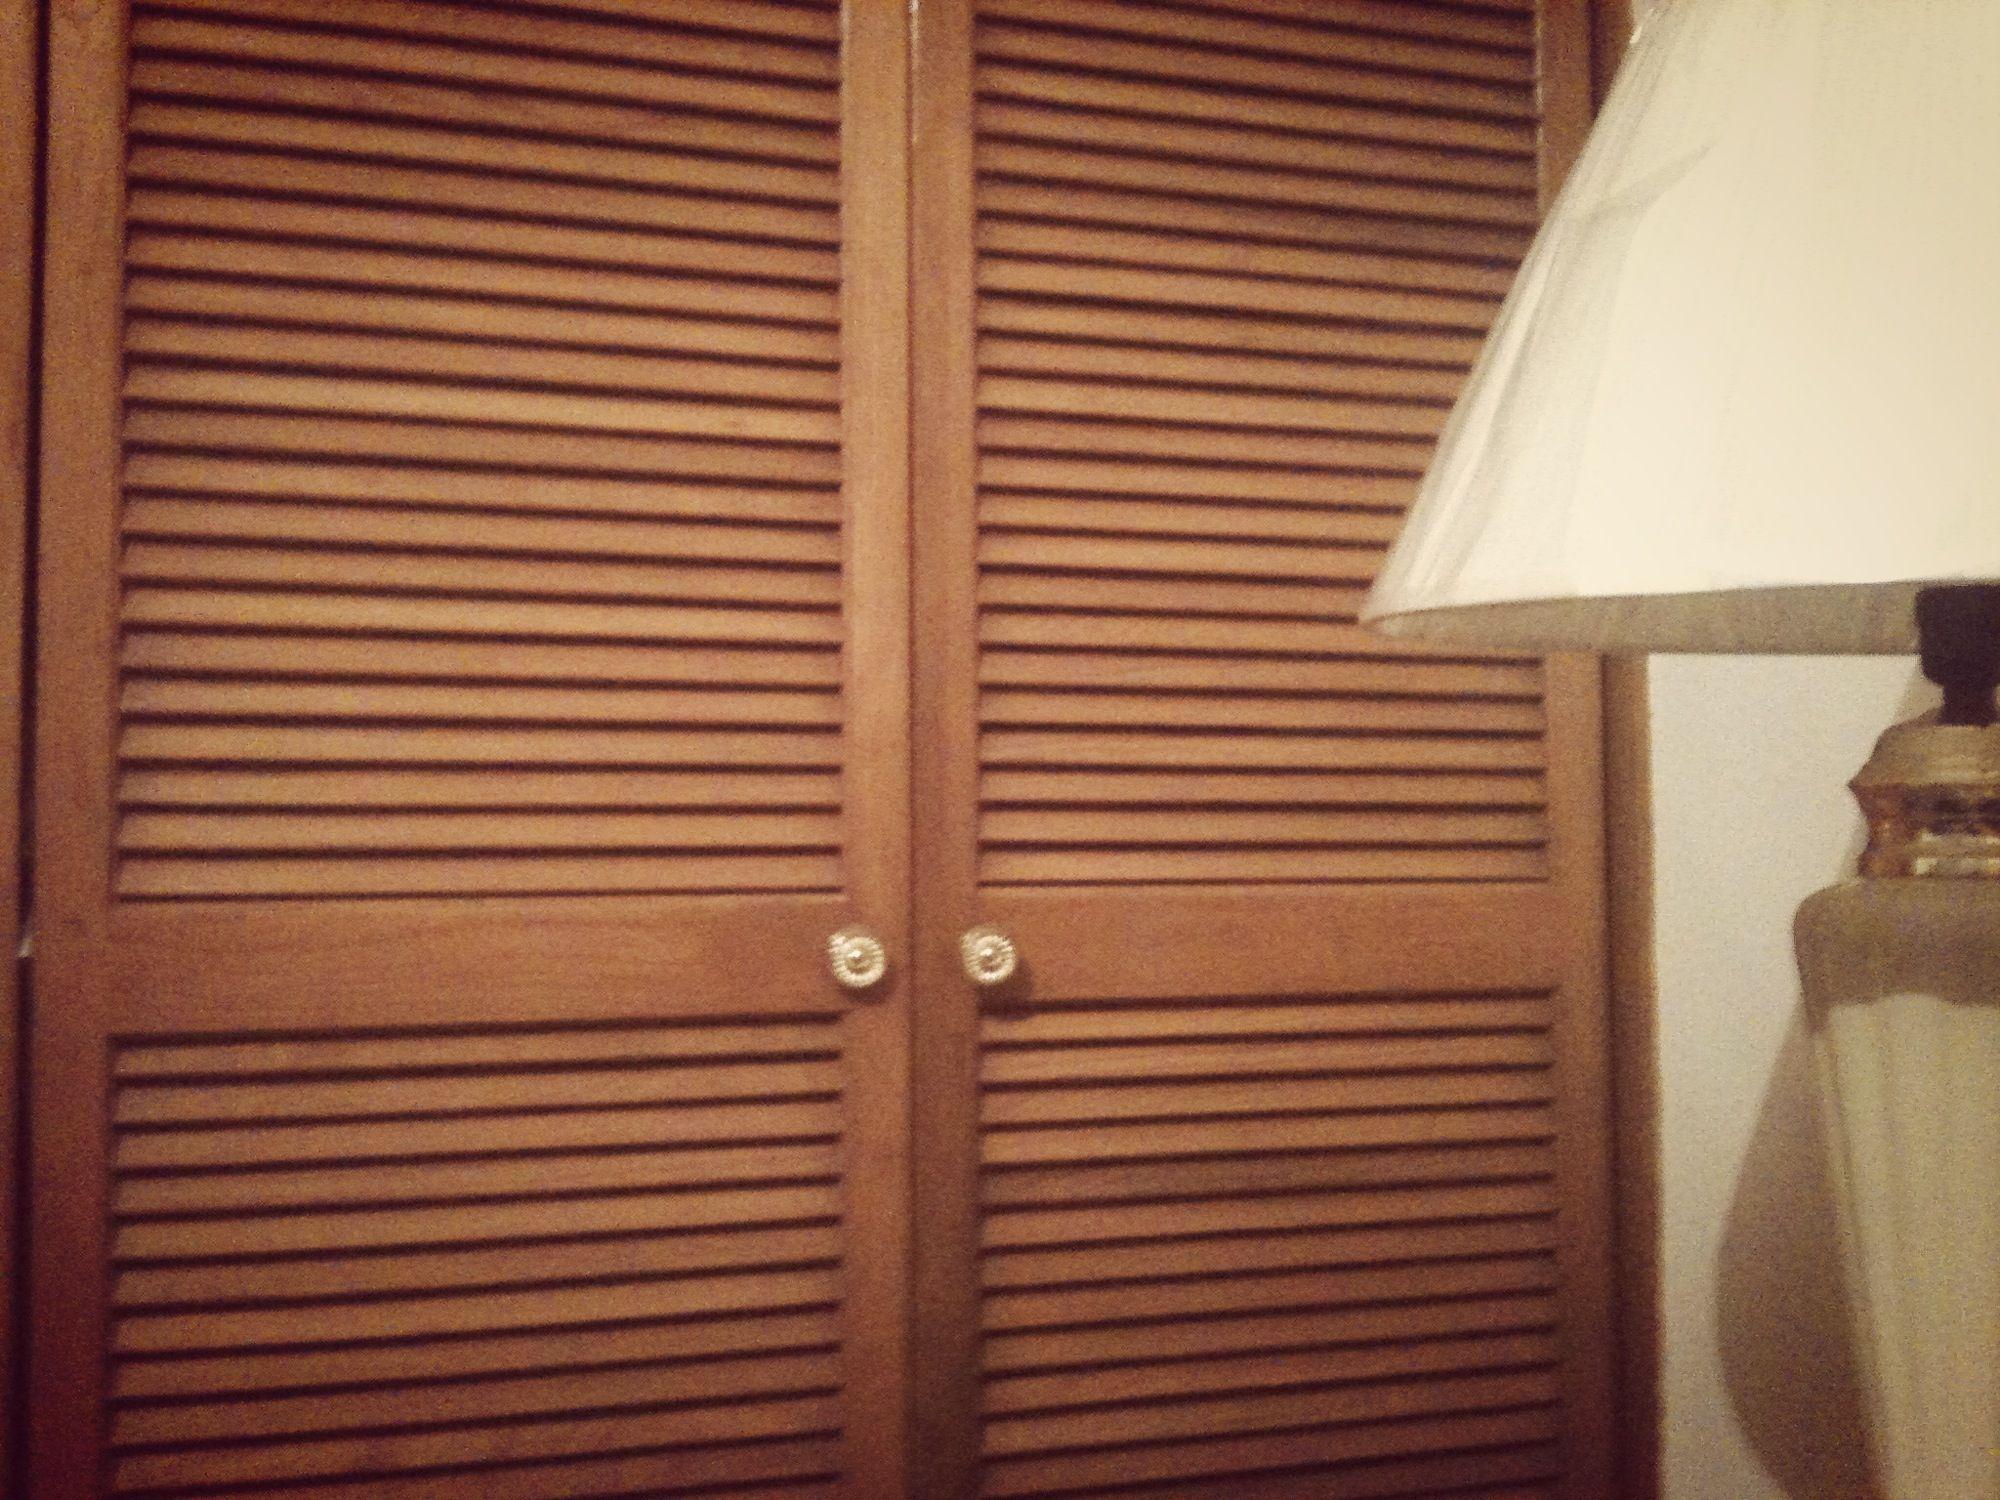 Home depot puertas para closet 28 images closets for Puertas corredizas